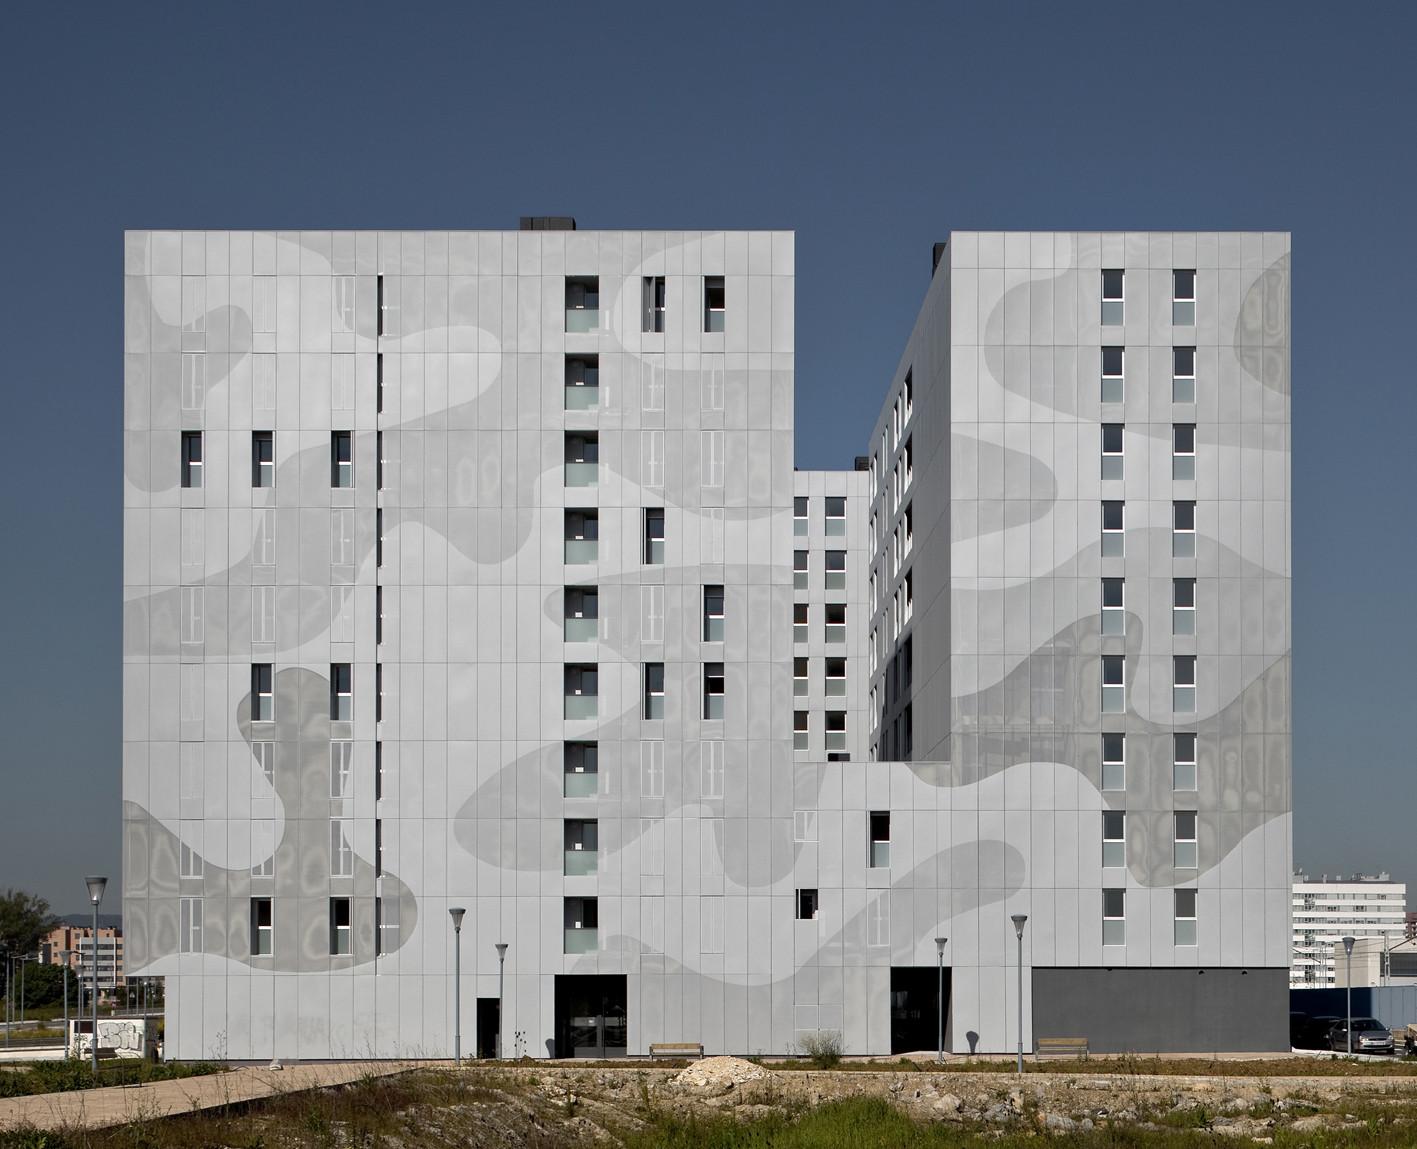 111 Dwellings in Larrein Salburua / Roberto Ercilla + Miguel Angel Campo, © Pedro Pegenaute